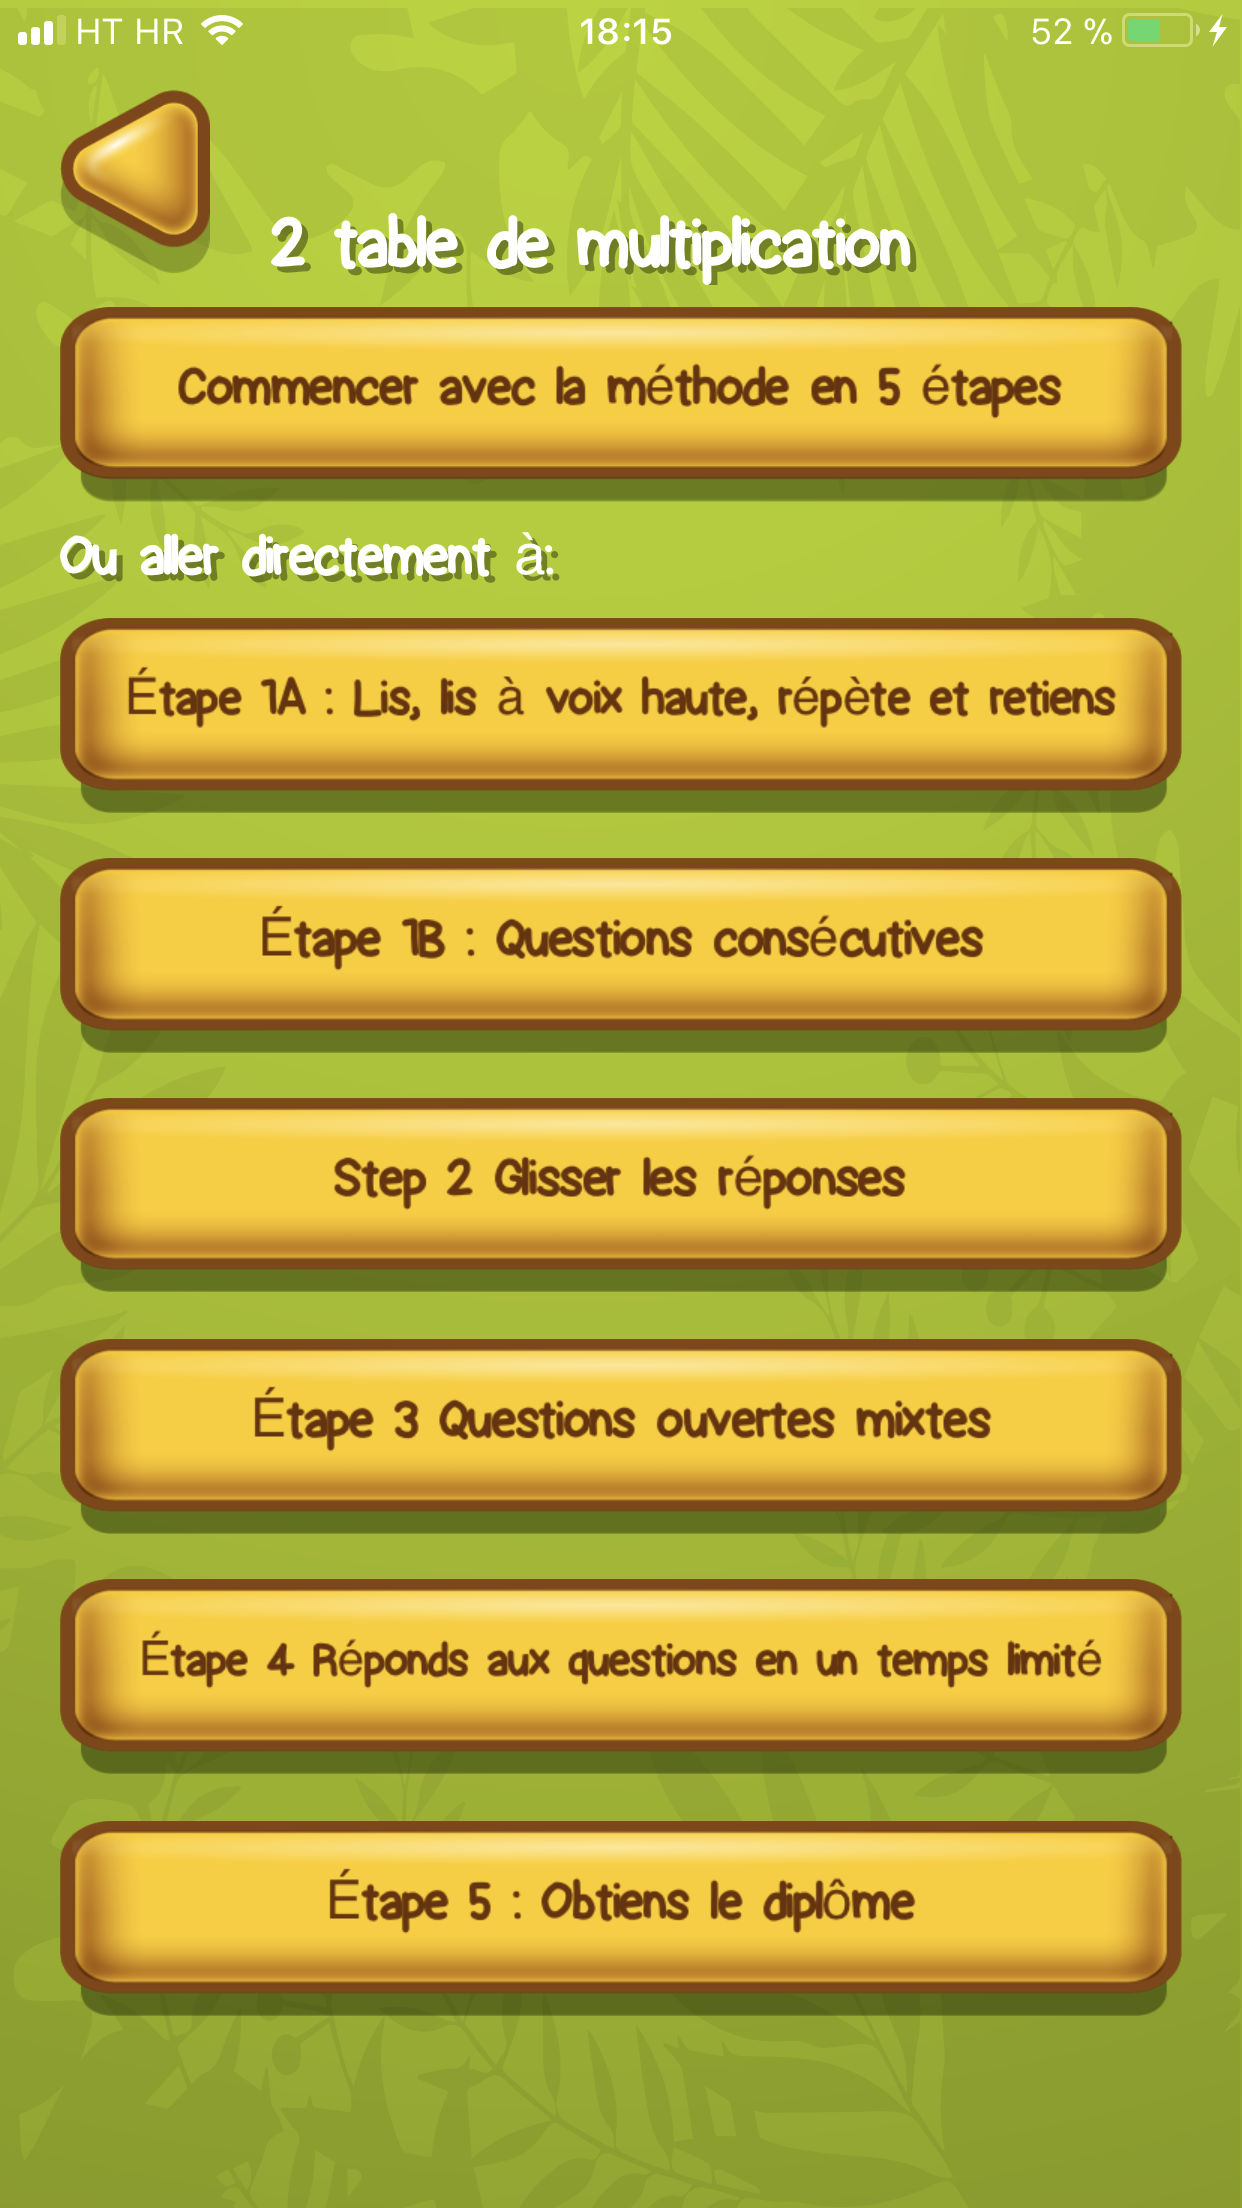 Table de multiplication App Exemple 2